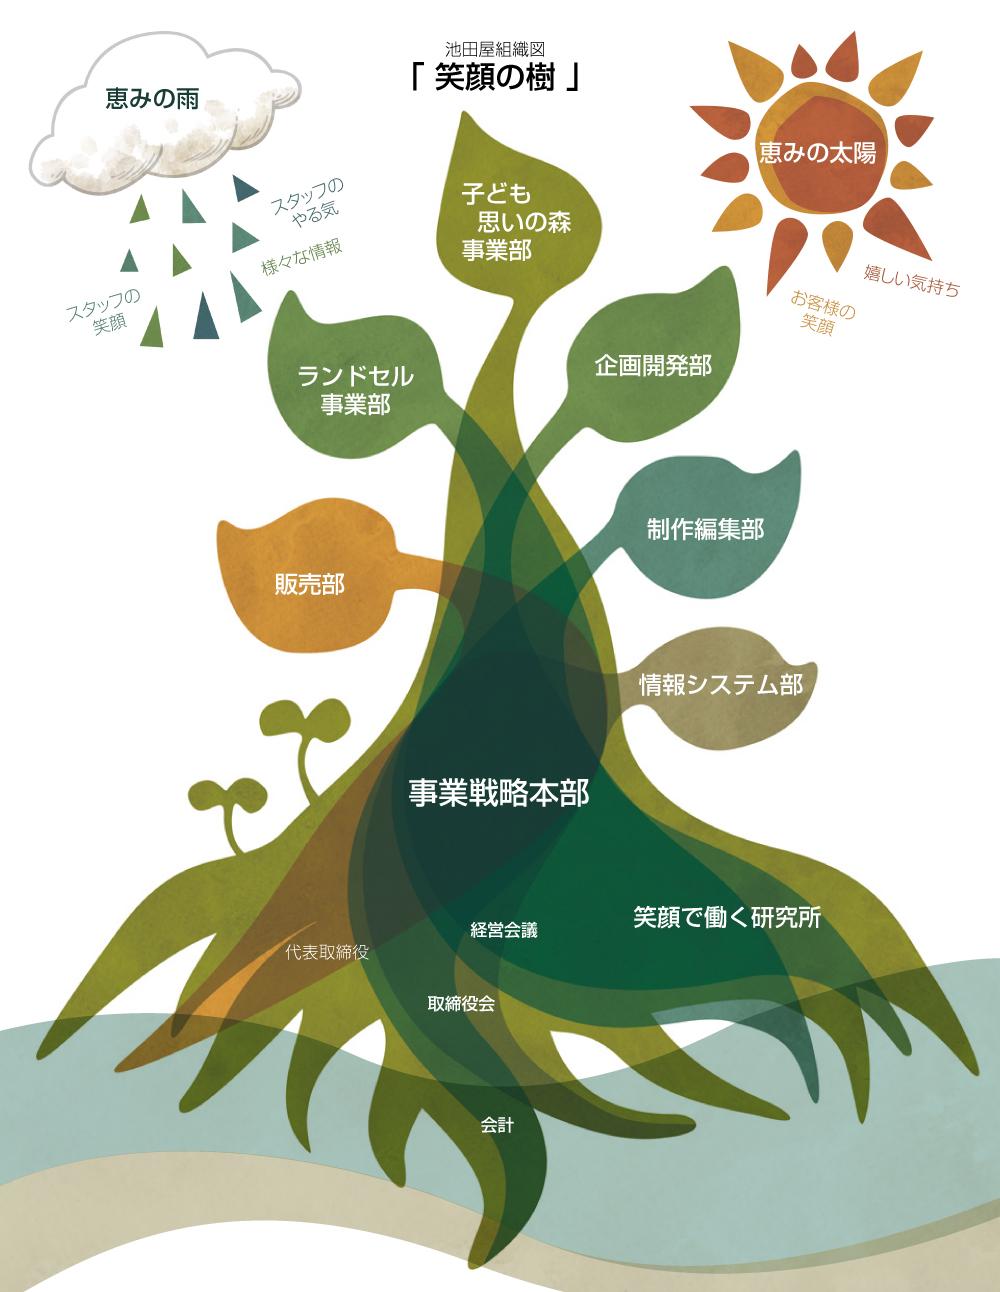 池田屋組織図笑顔の樹